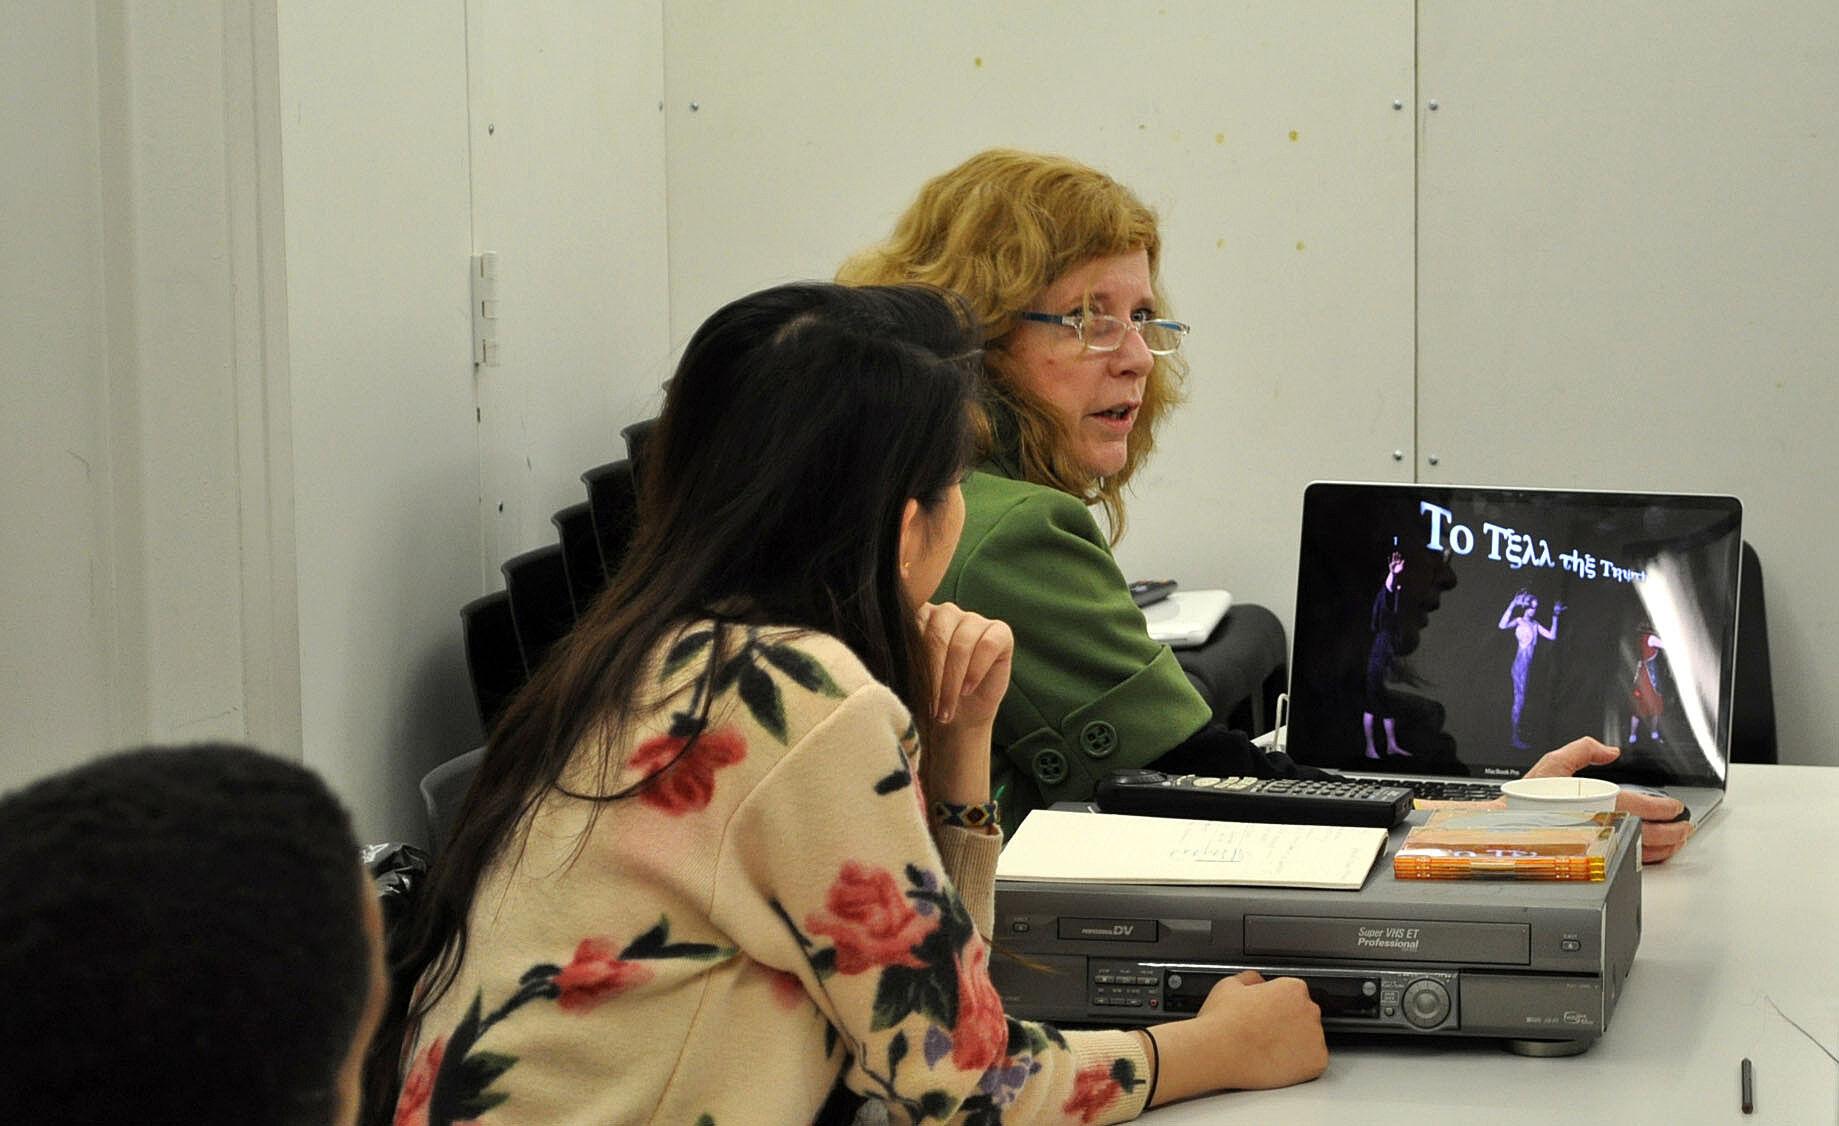 teacher showing her work from a laptop